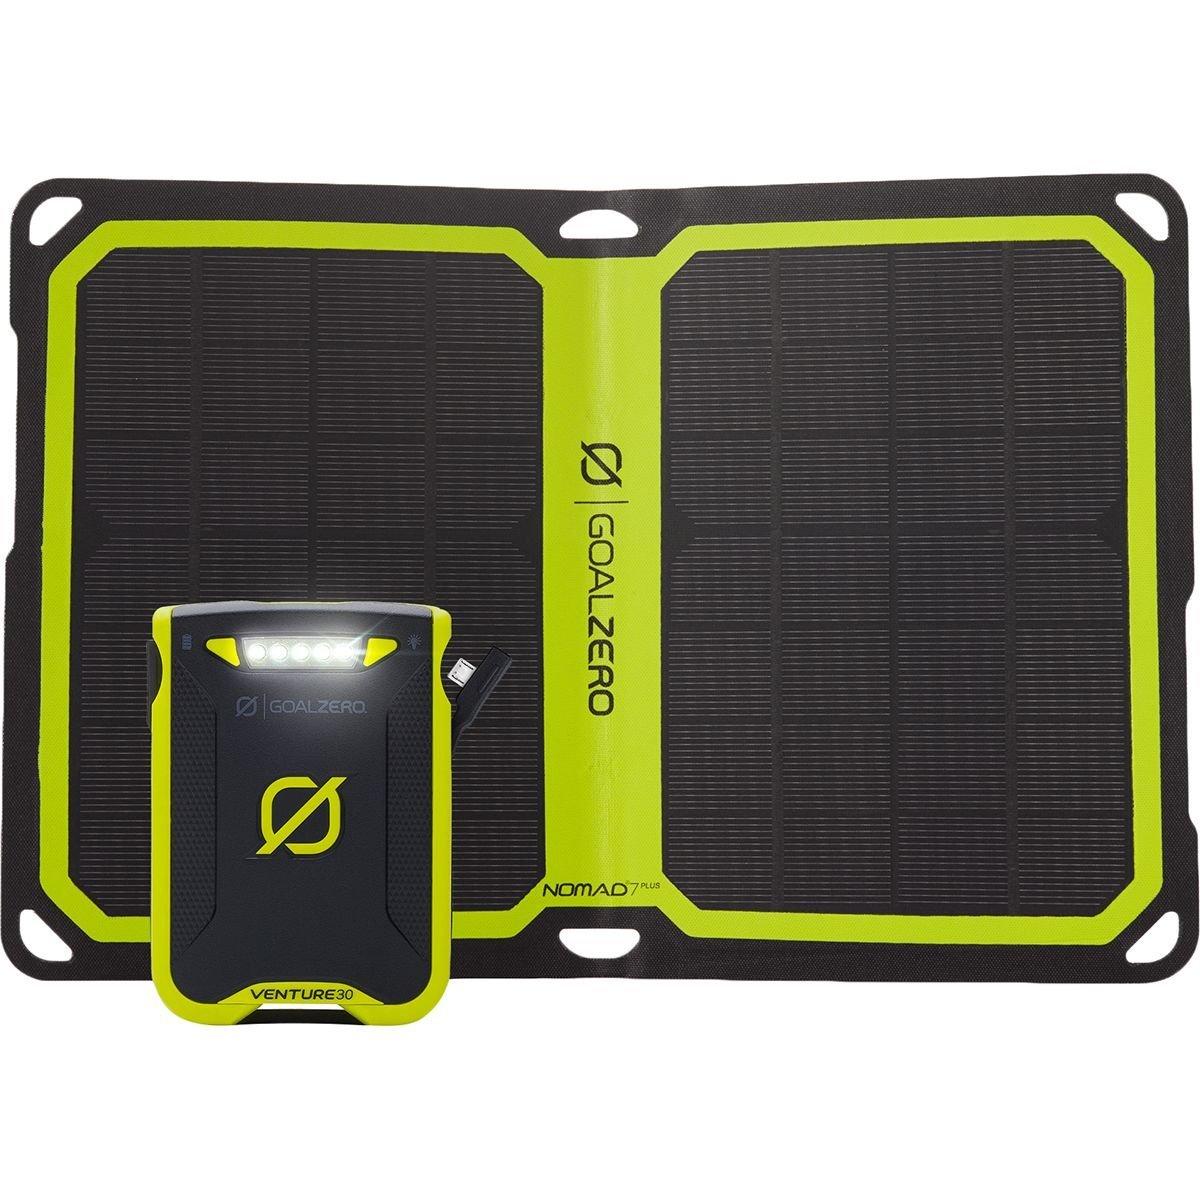 Best Portable Charger Kit OUTDOOR   Goal Zero   Venture 30 & Nomad 7